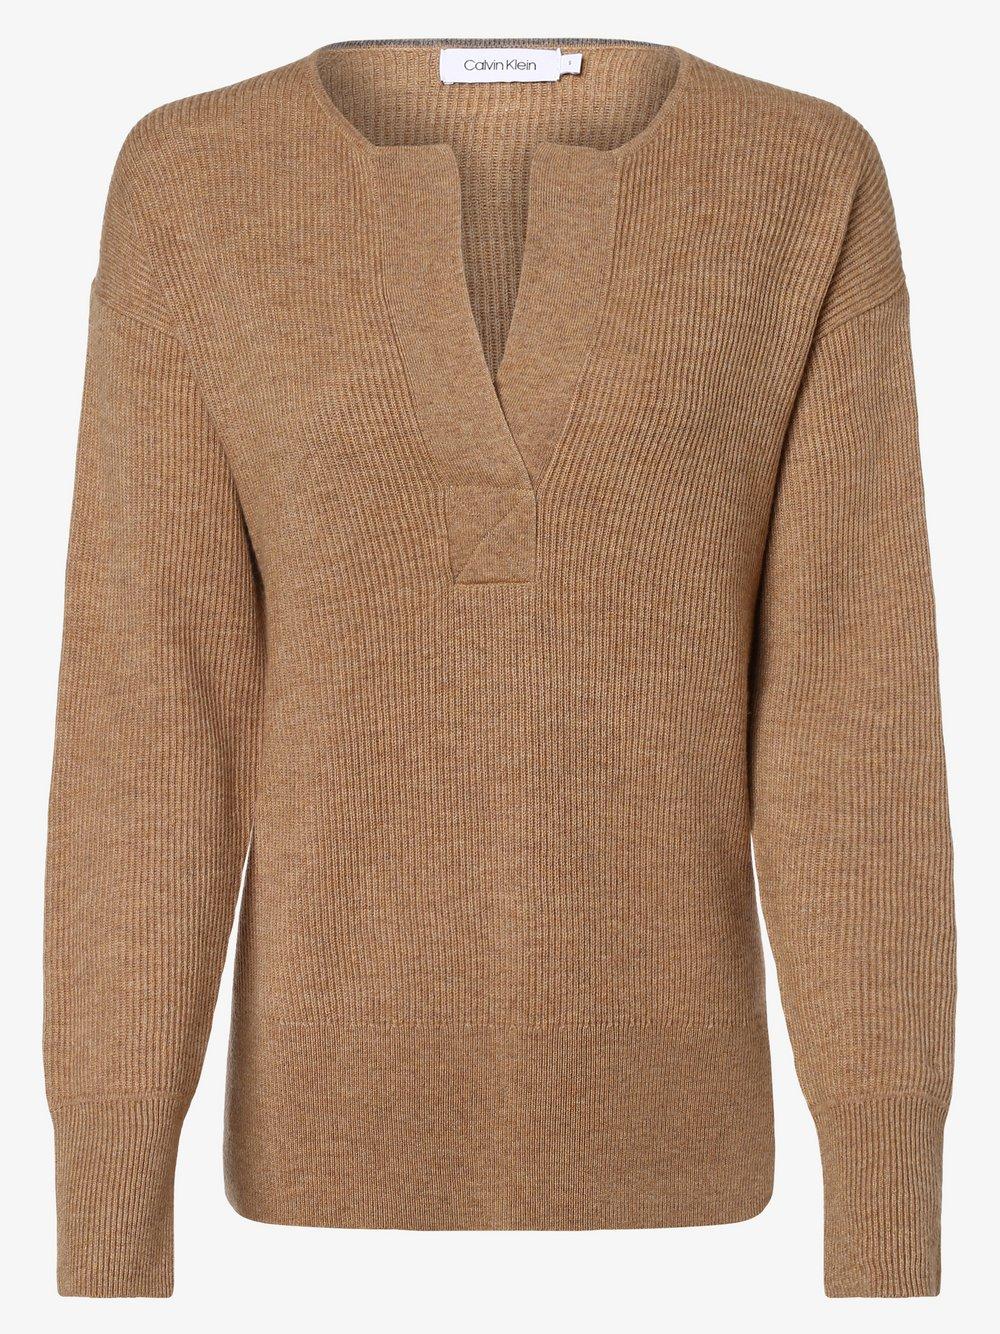 Calvin Klein - Sweter damski, beżowy